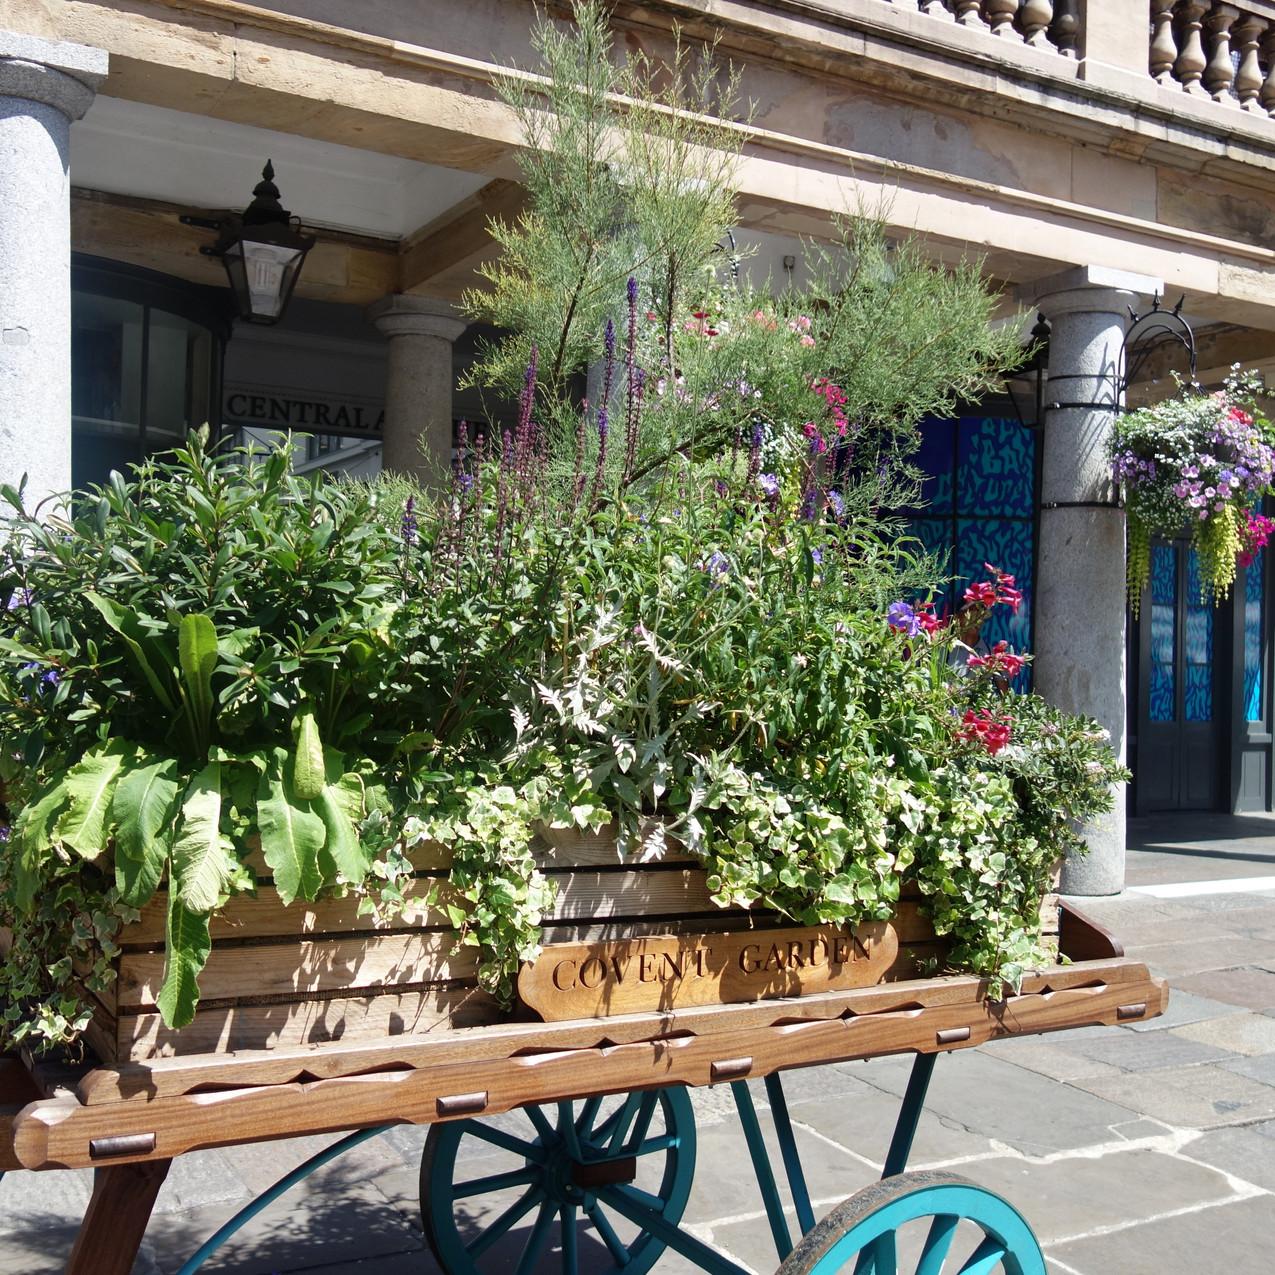 Covent Garden Piazza